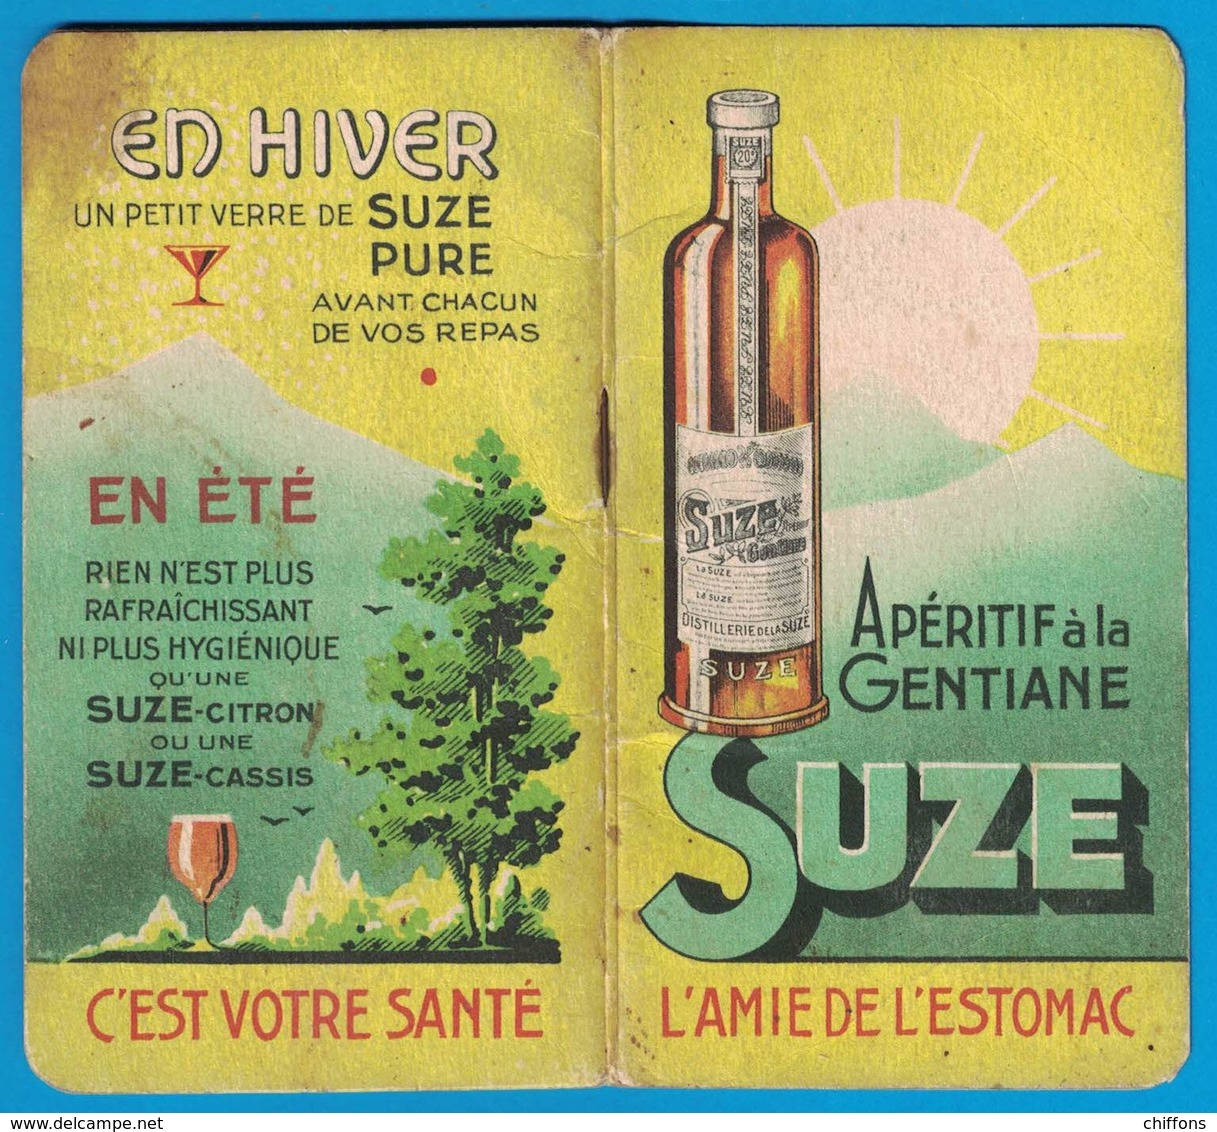 CARNET APERITIF A LA GENTIANE SUZE L'AMIE DE L'ESTOMAC CALENDRIER 1940 - Advertising